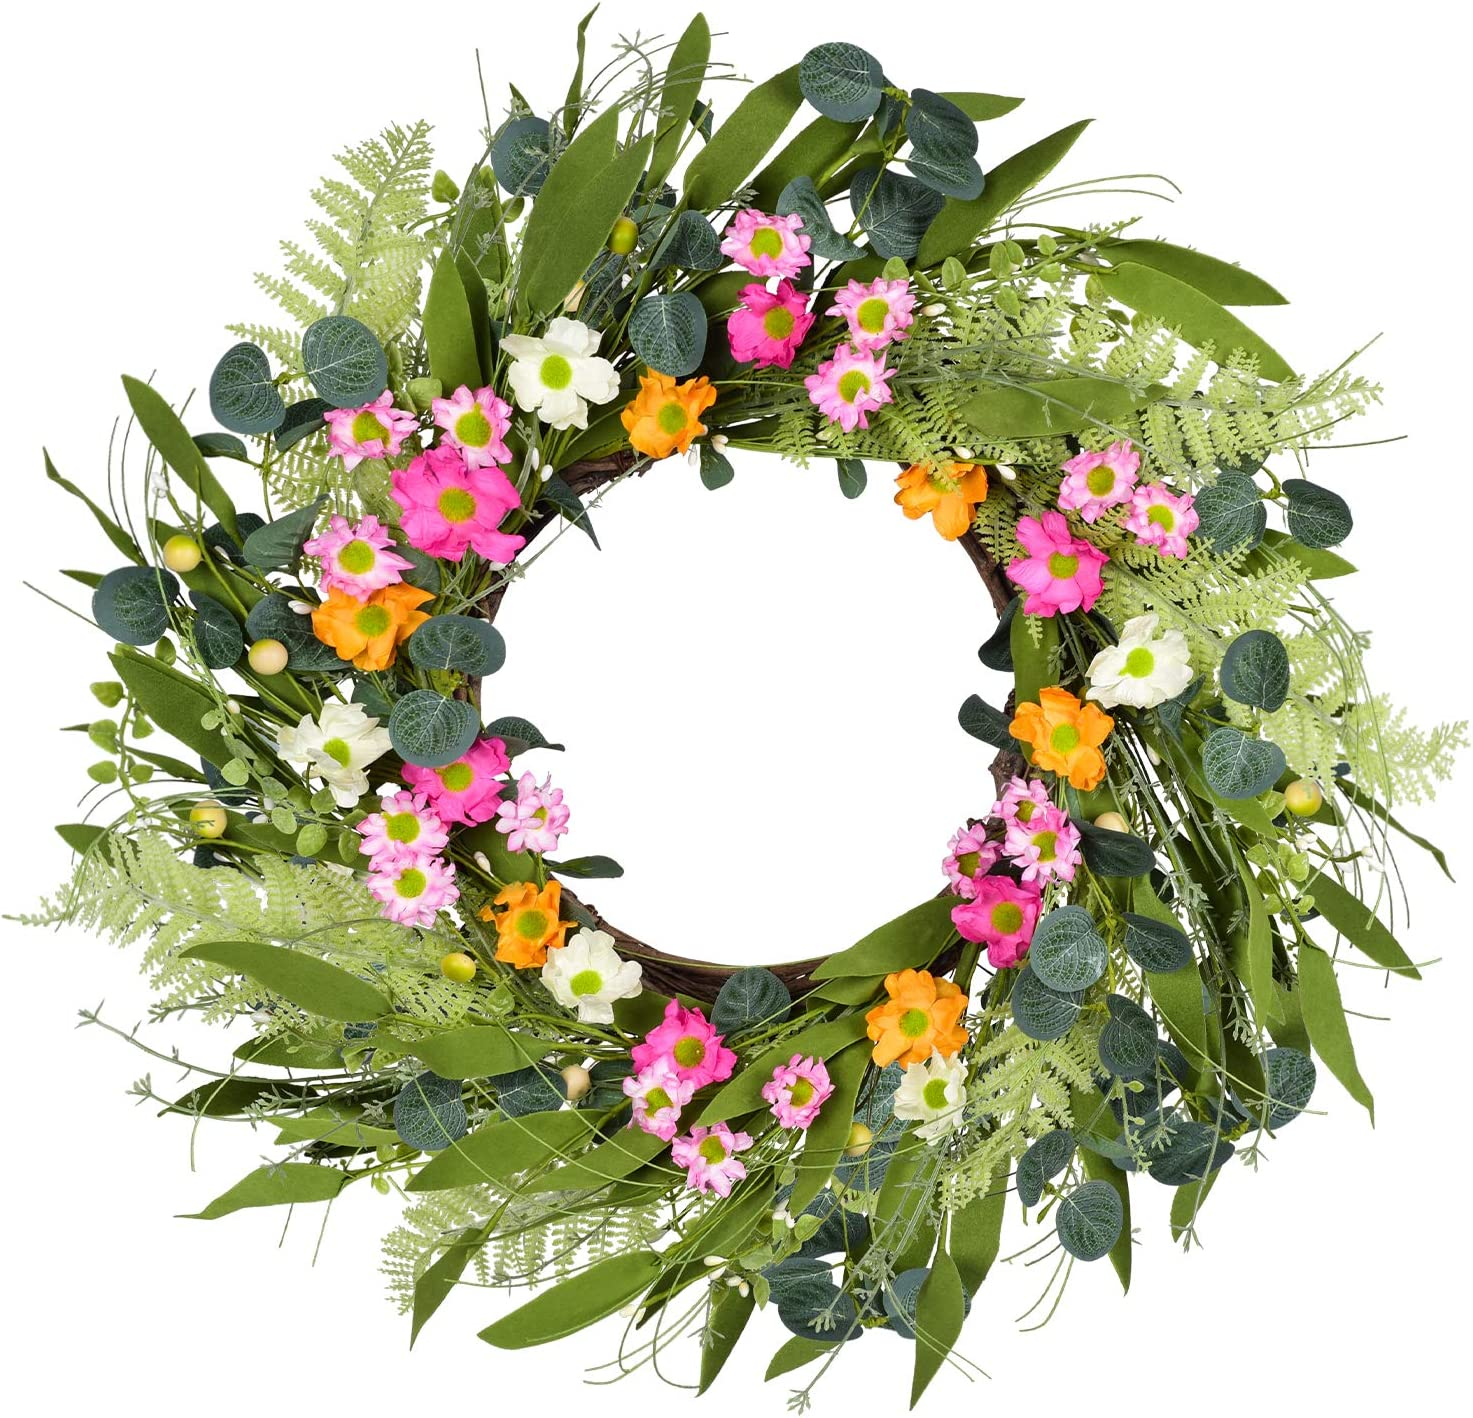 Wofair Artificial Daisy Flower Wreath, 20